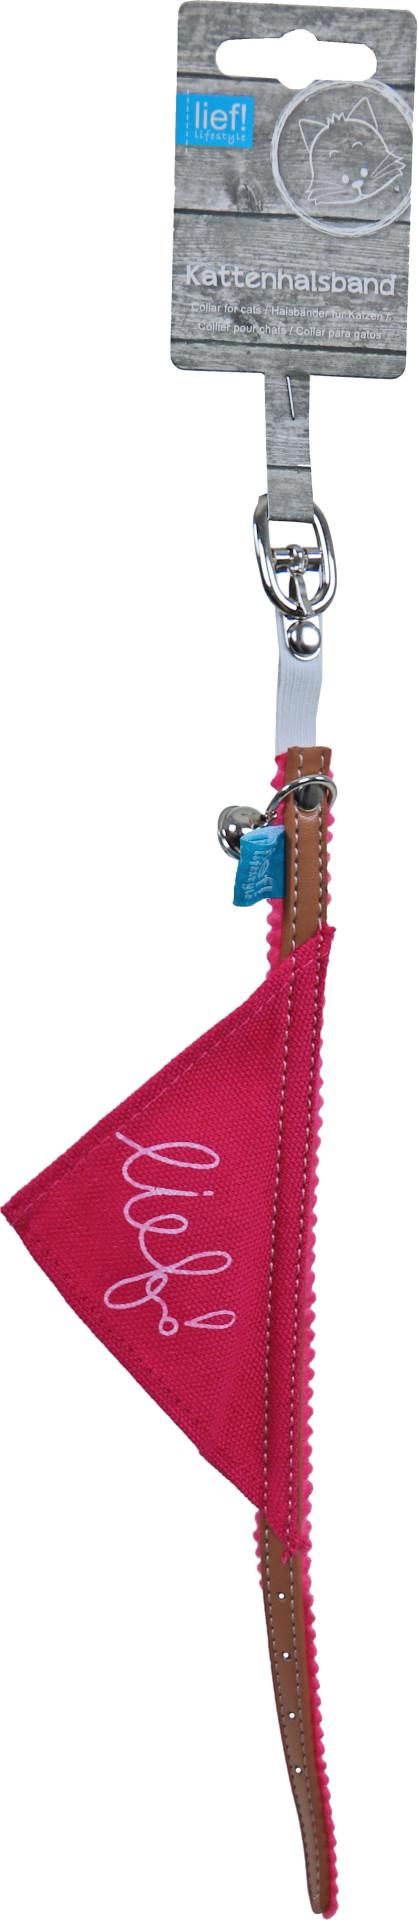 lief! lifestyle Girls kattenhalsband met zakdoek